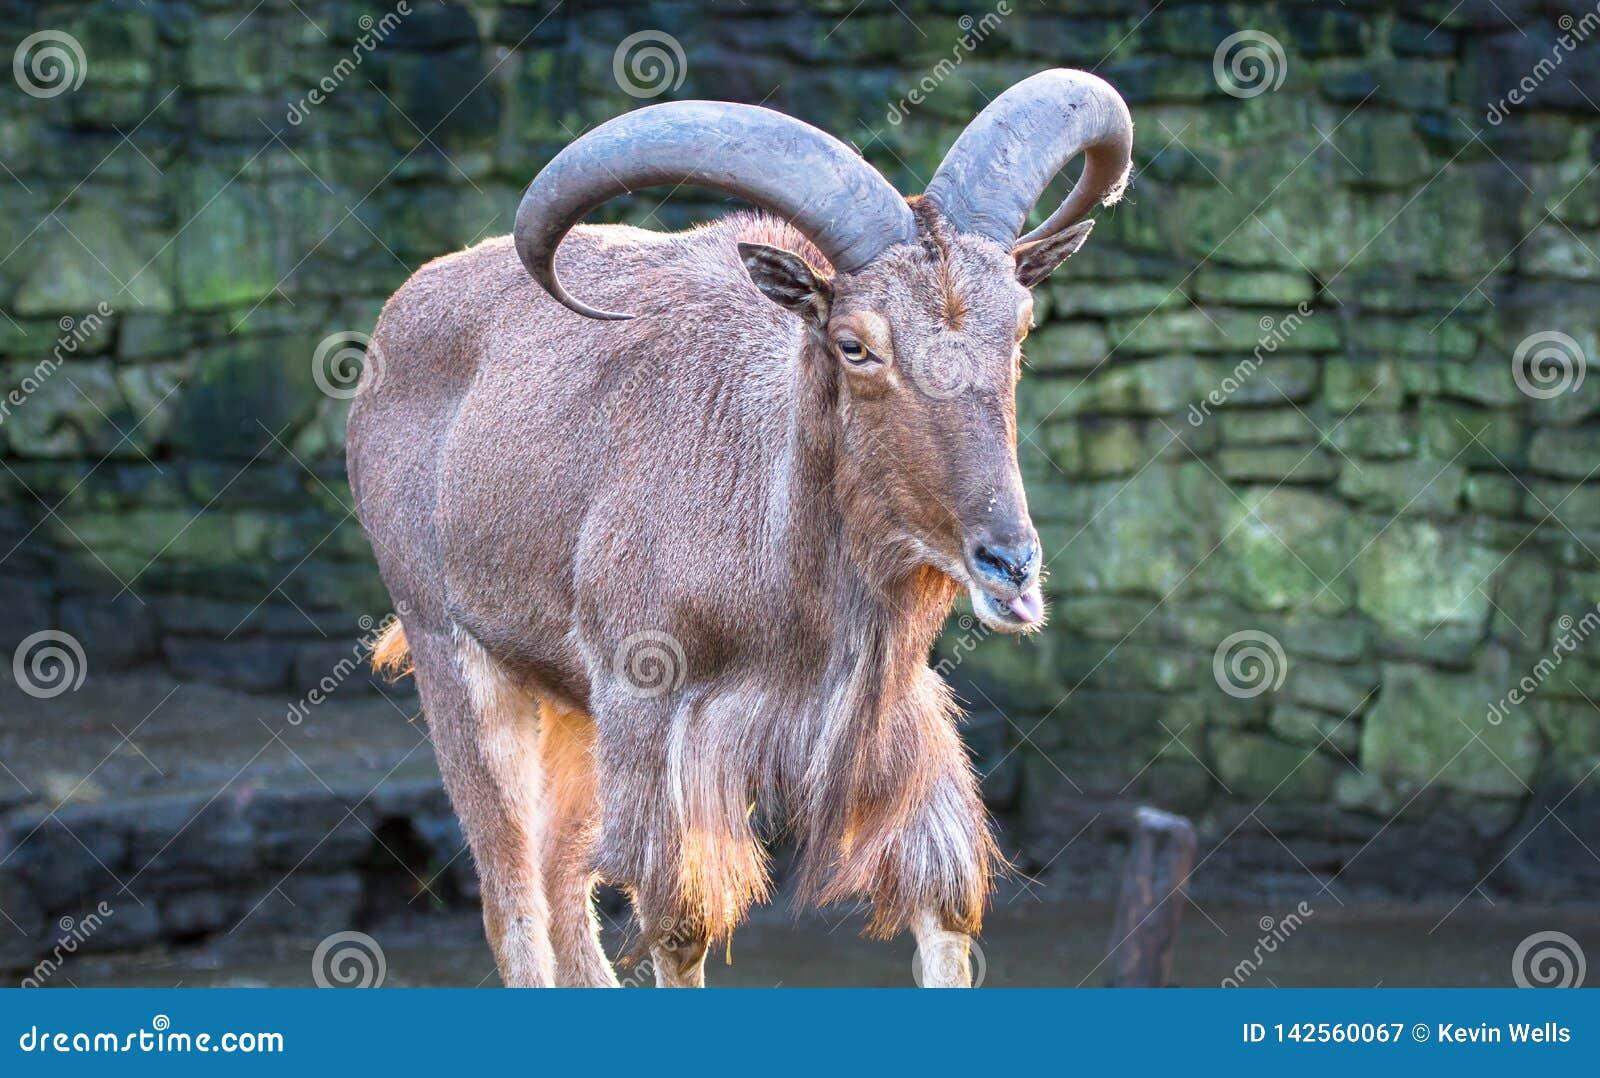 Barbary sheep Ammotragus lervia licking its lips